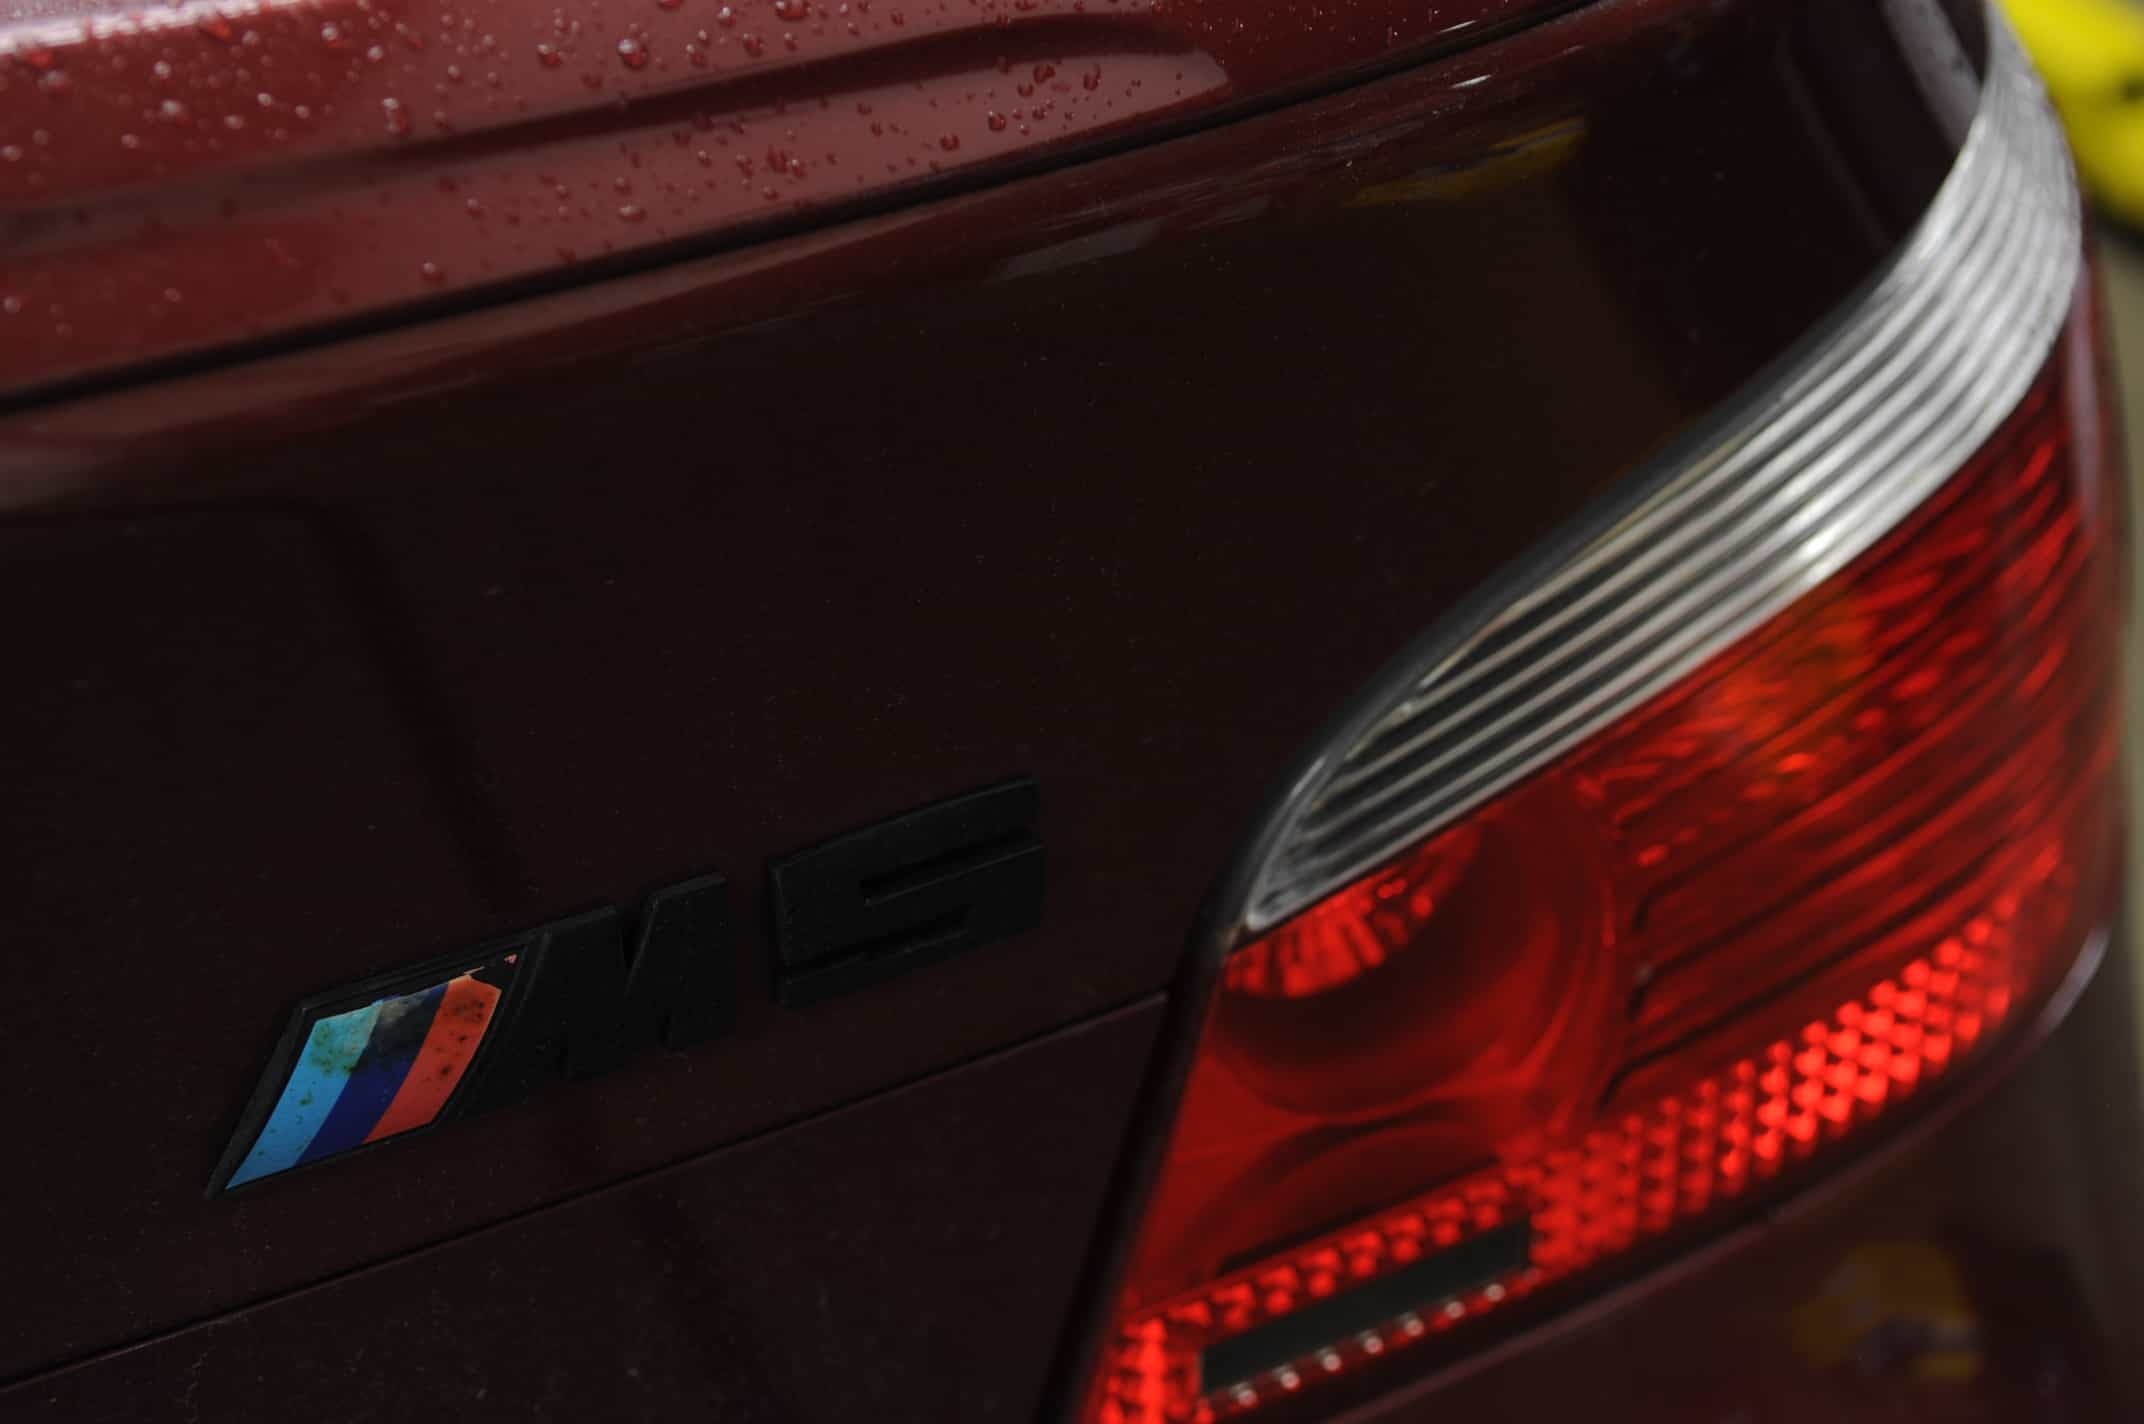 2006 Bmw E60 M5 Vanos Timing Car Repair Amp Performance Fluid Motorunion 2108 W Ferry Rd